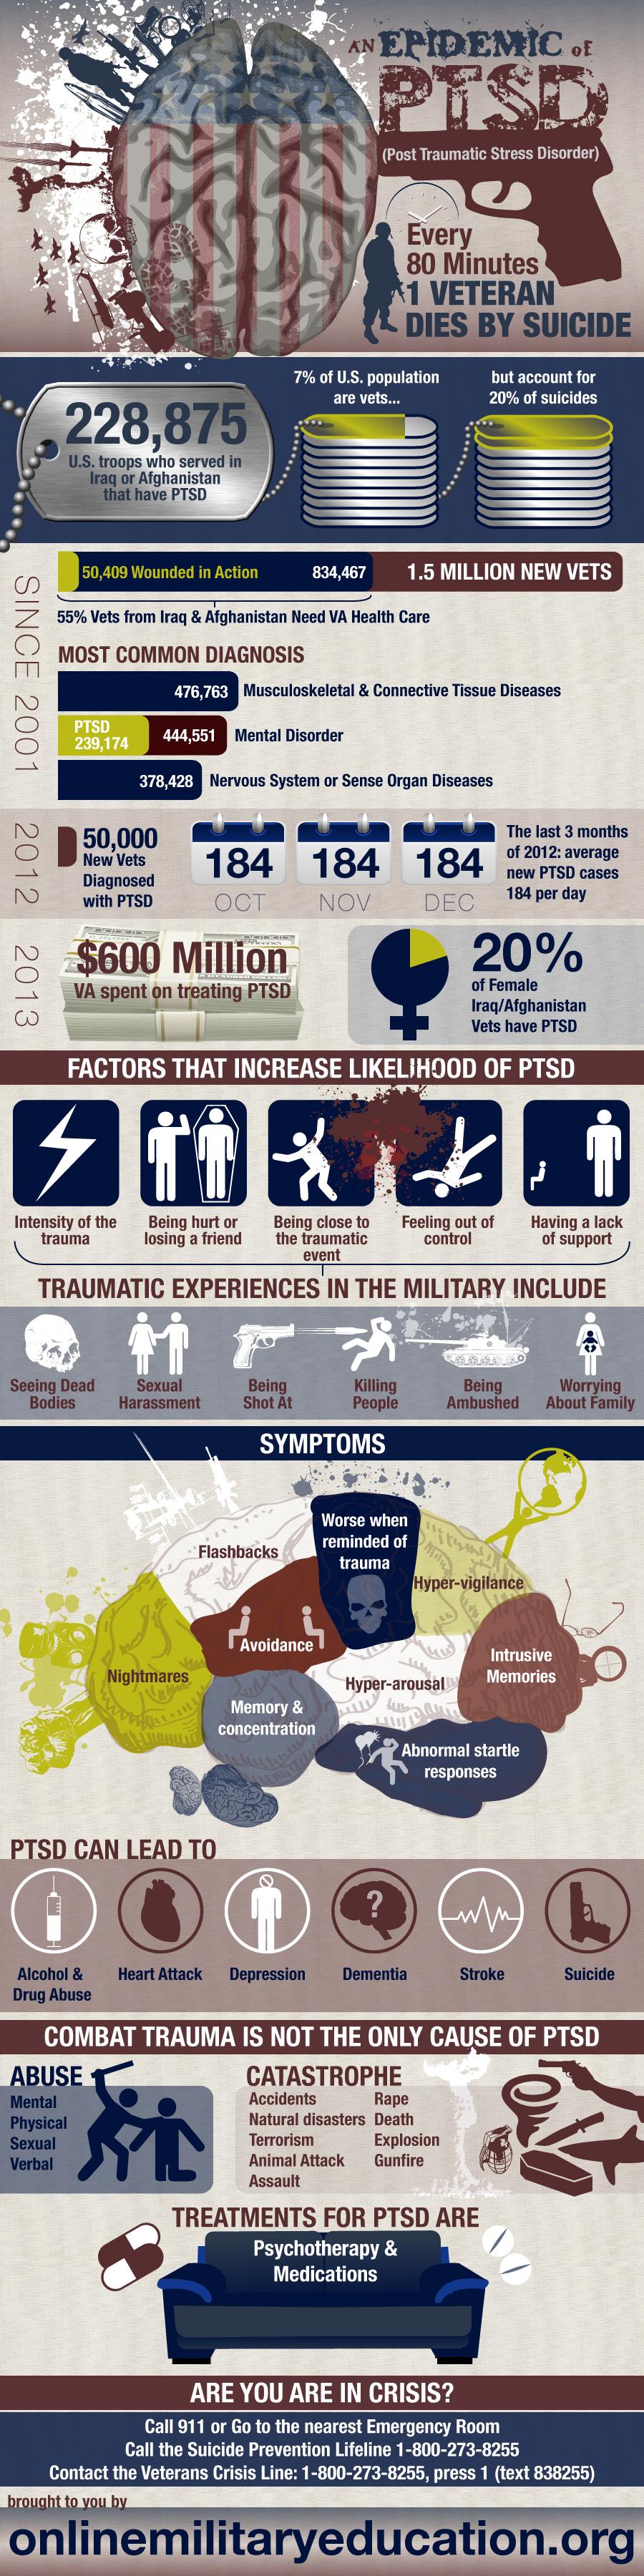 Has PTSD Become an Epidemic?